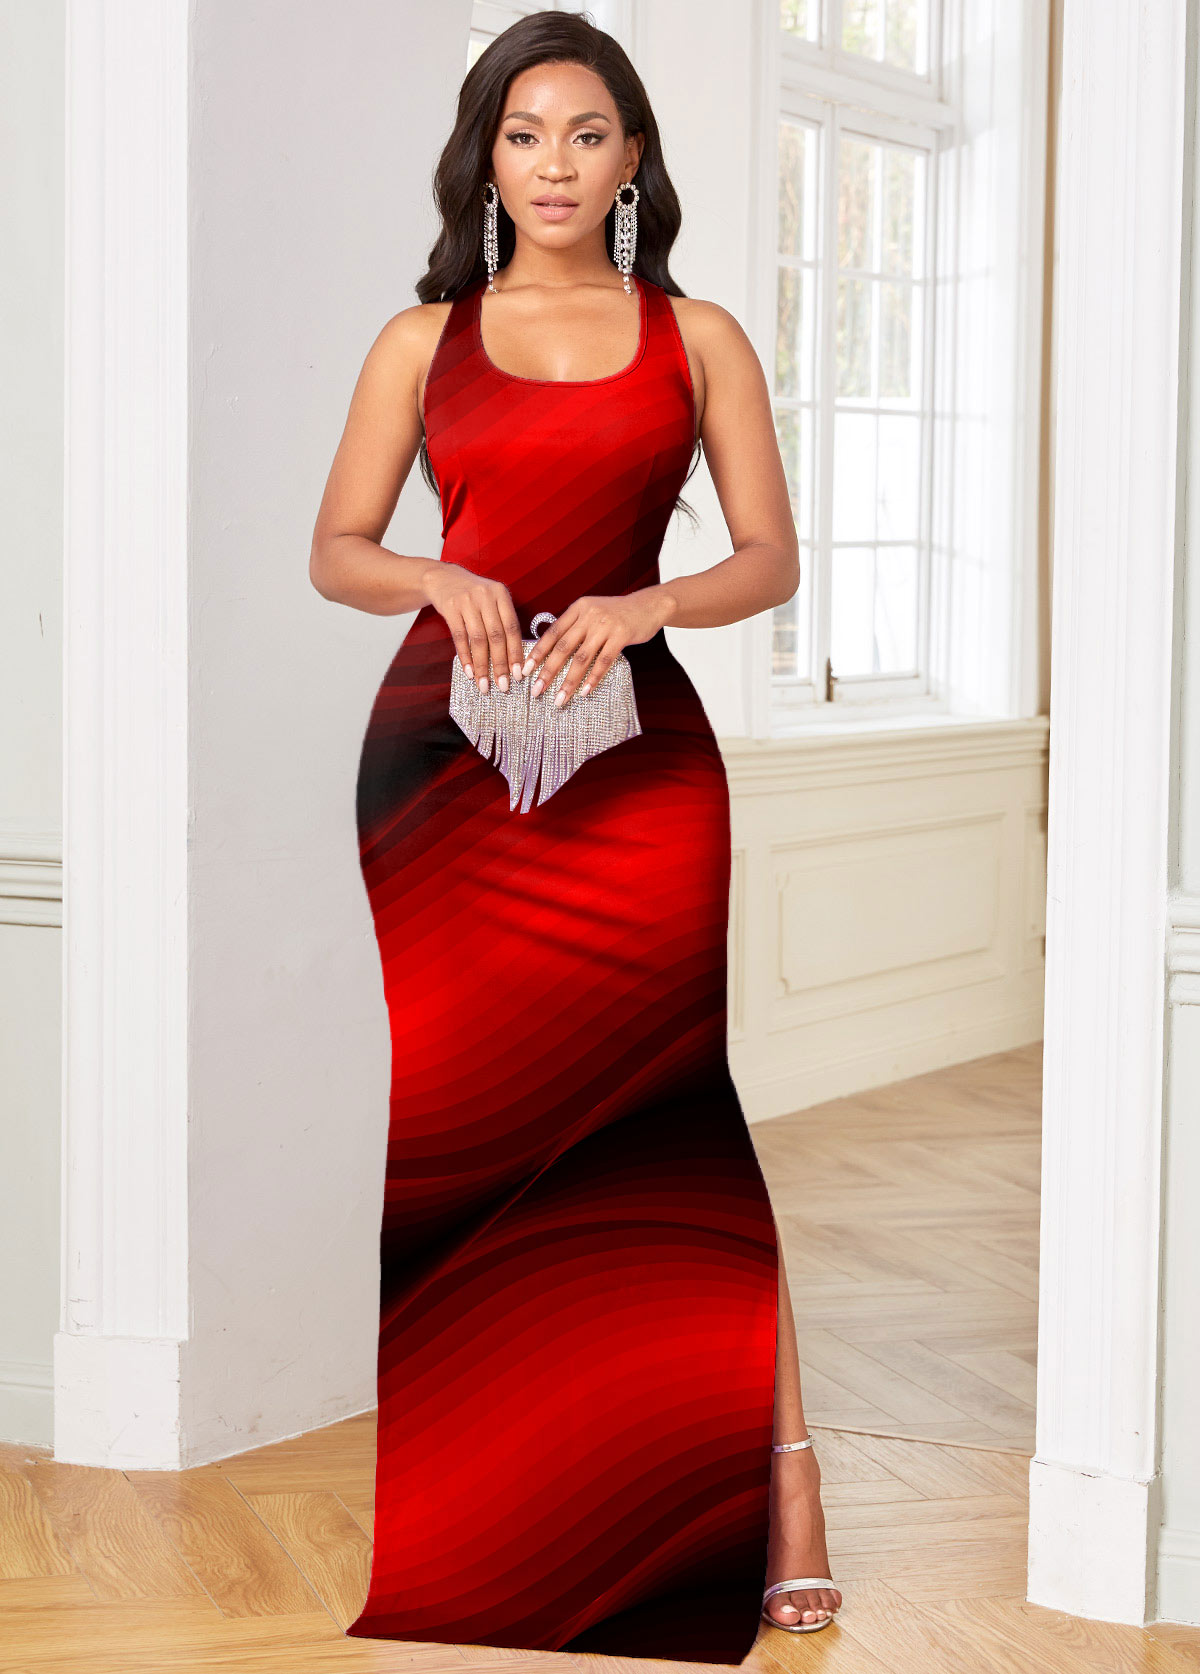 ROTITA Ombre High Slit Cutout Detail Sleeveless Bodycon Dress